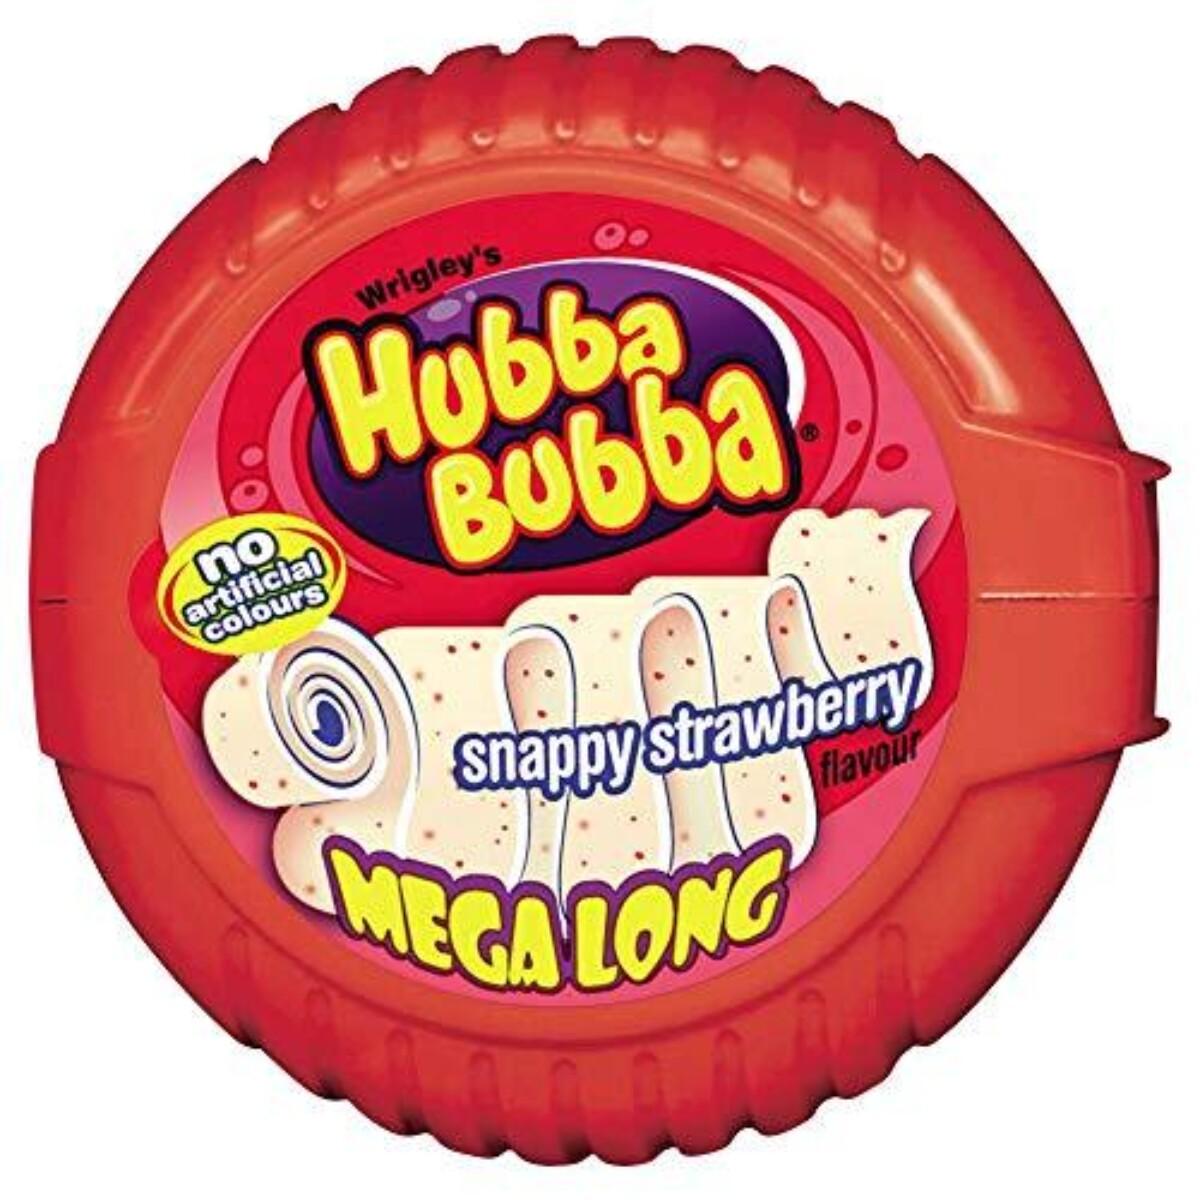 Hubba Bubba Mega long - Jordbær